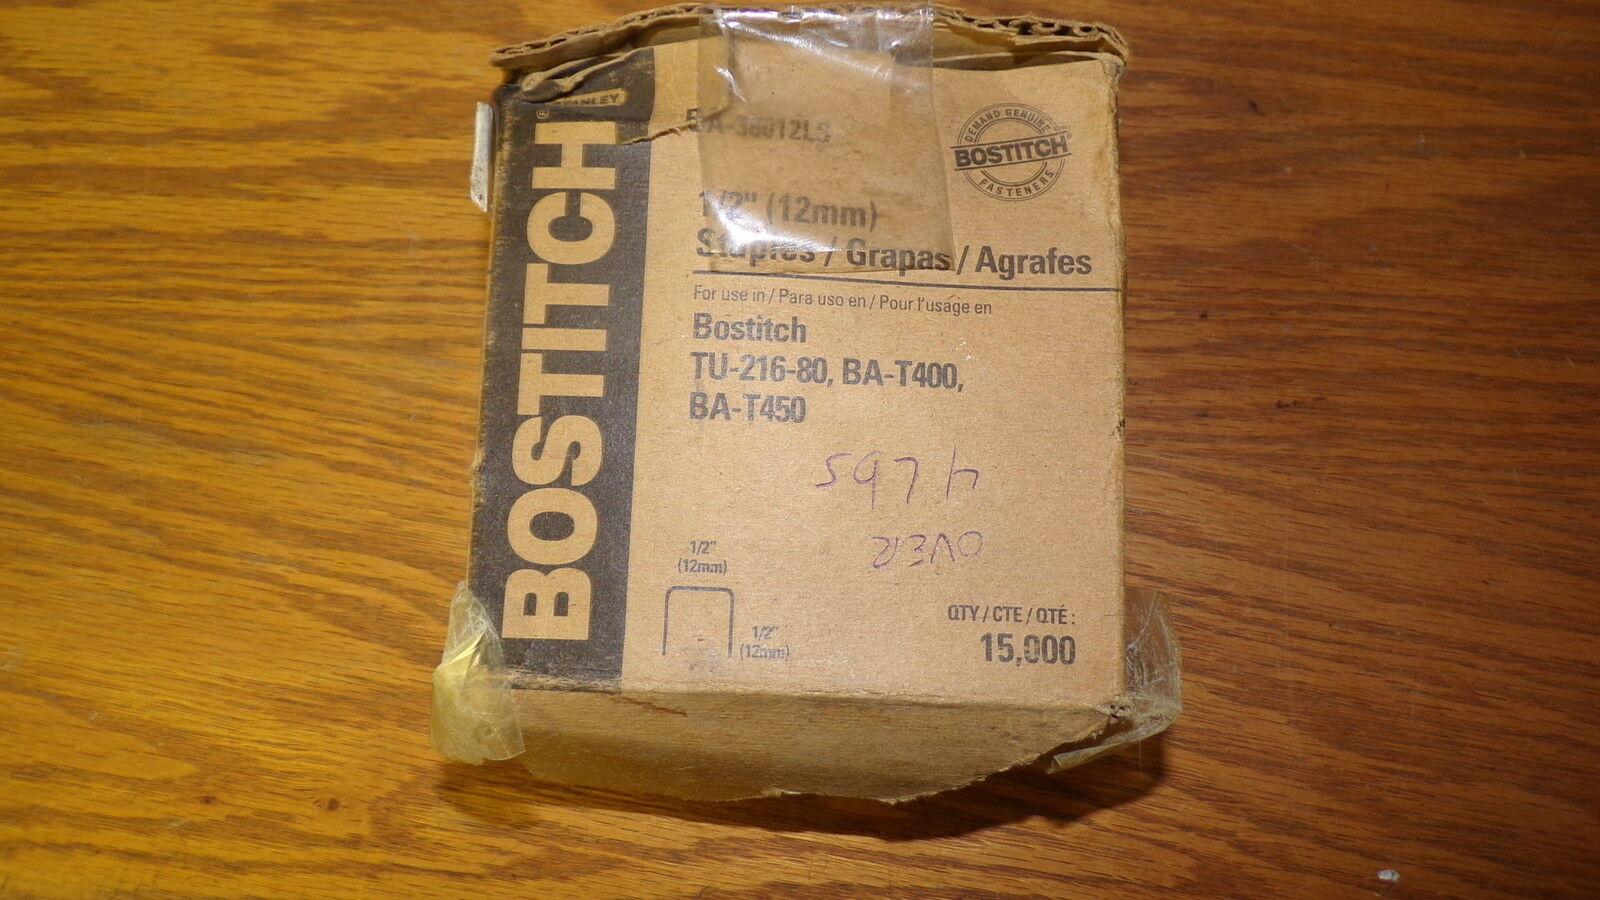 NEW Bostitch TU-216-80 BA-T400 BA-T450 1 2  Staples 4 Pound Box